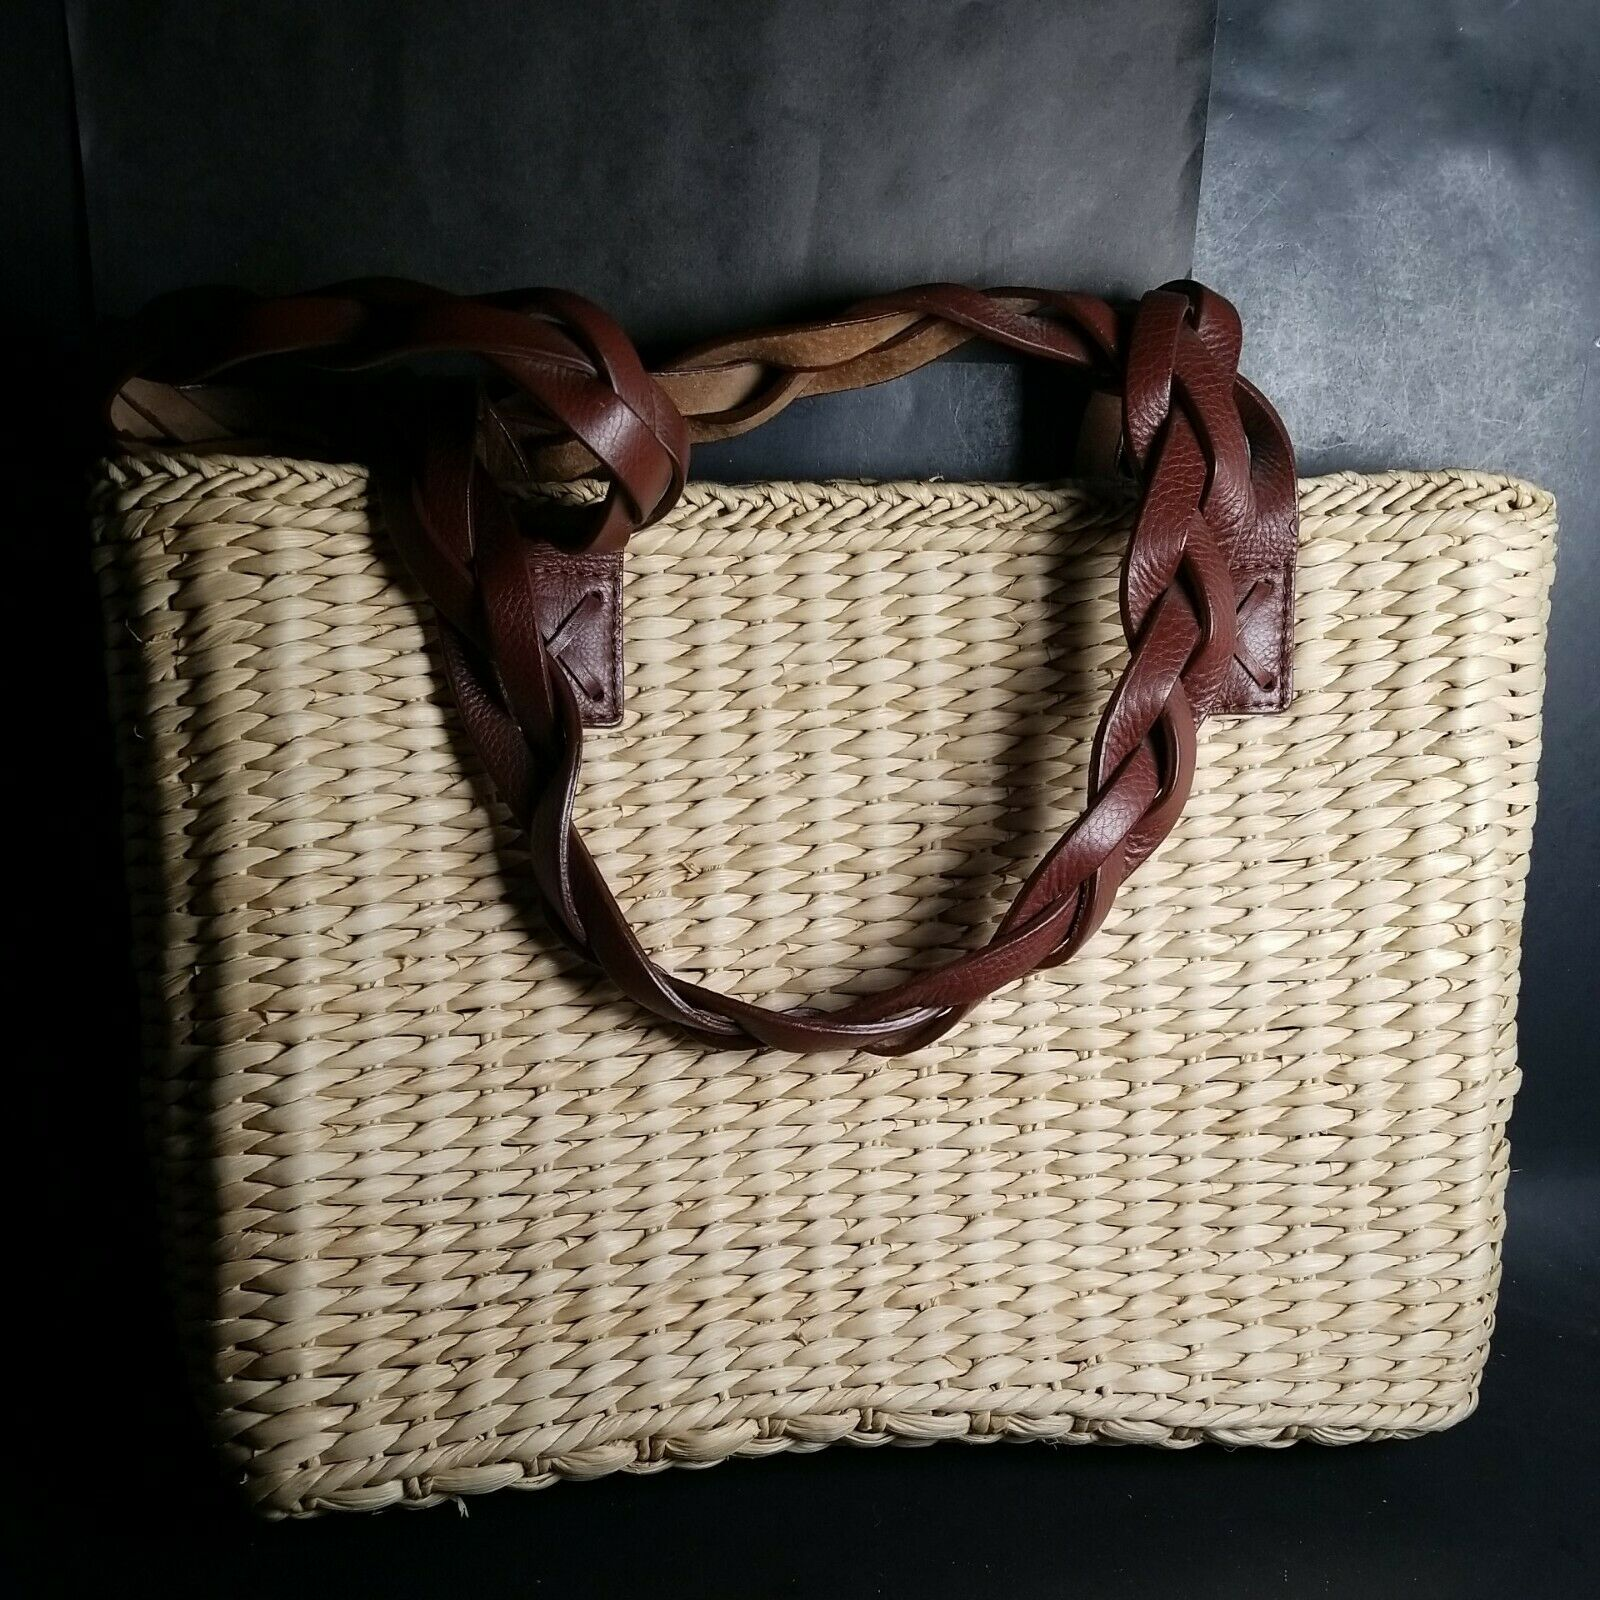 The Walking Co Company Bag Leather Cornhusk Wicker Purse Tote 11